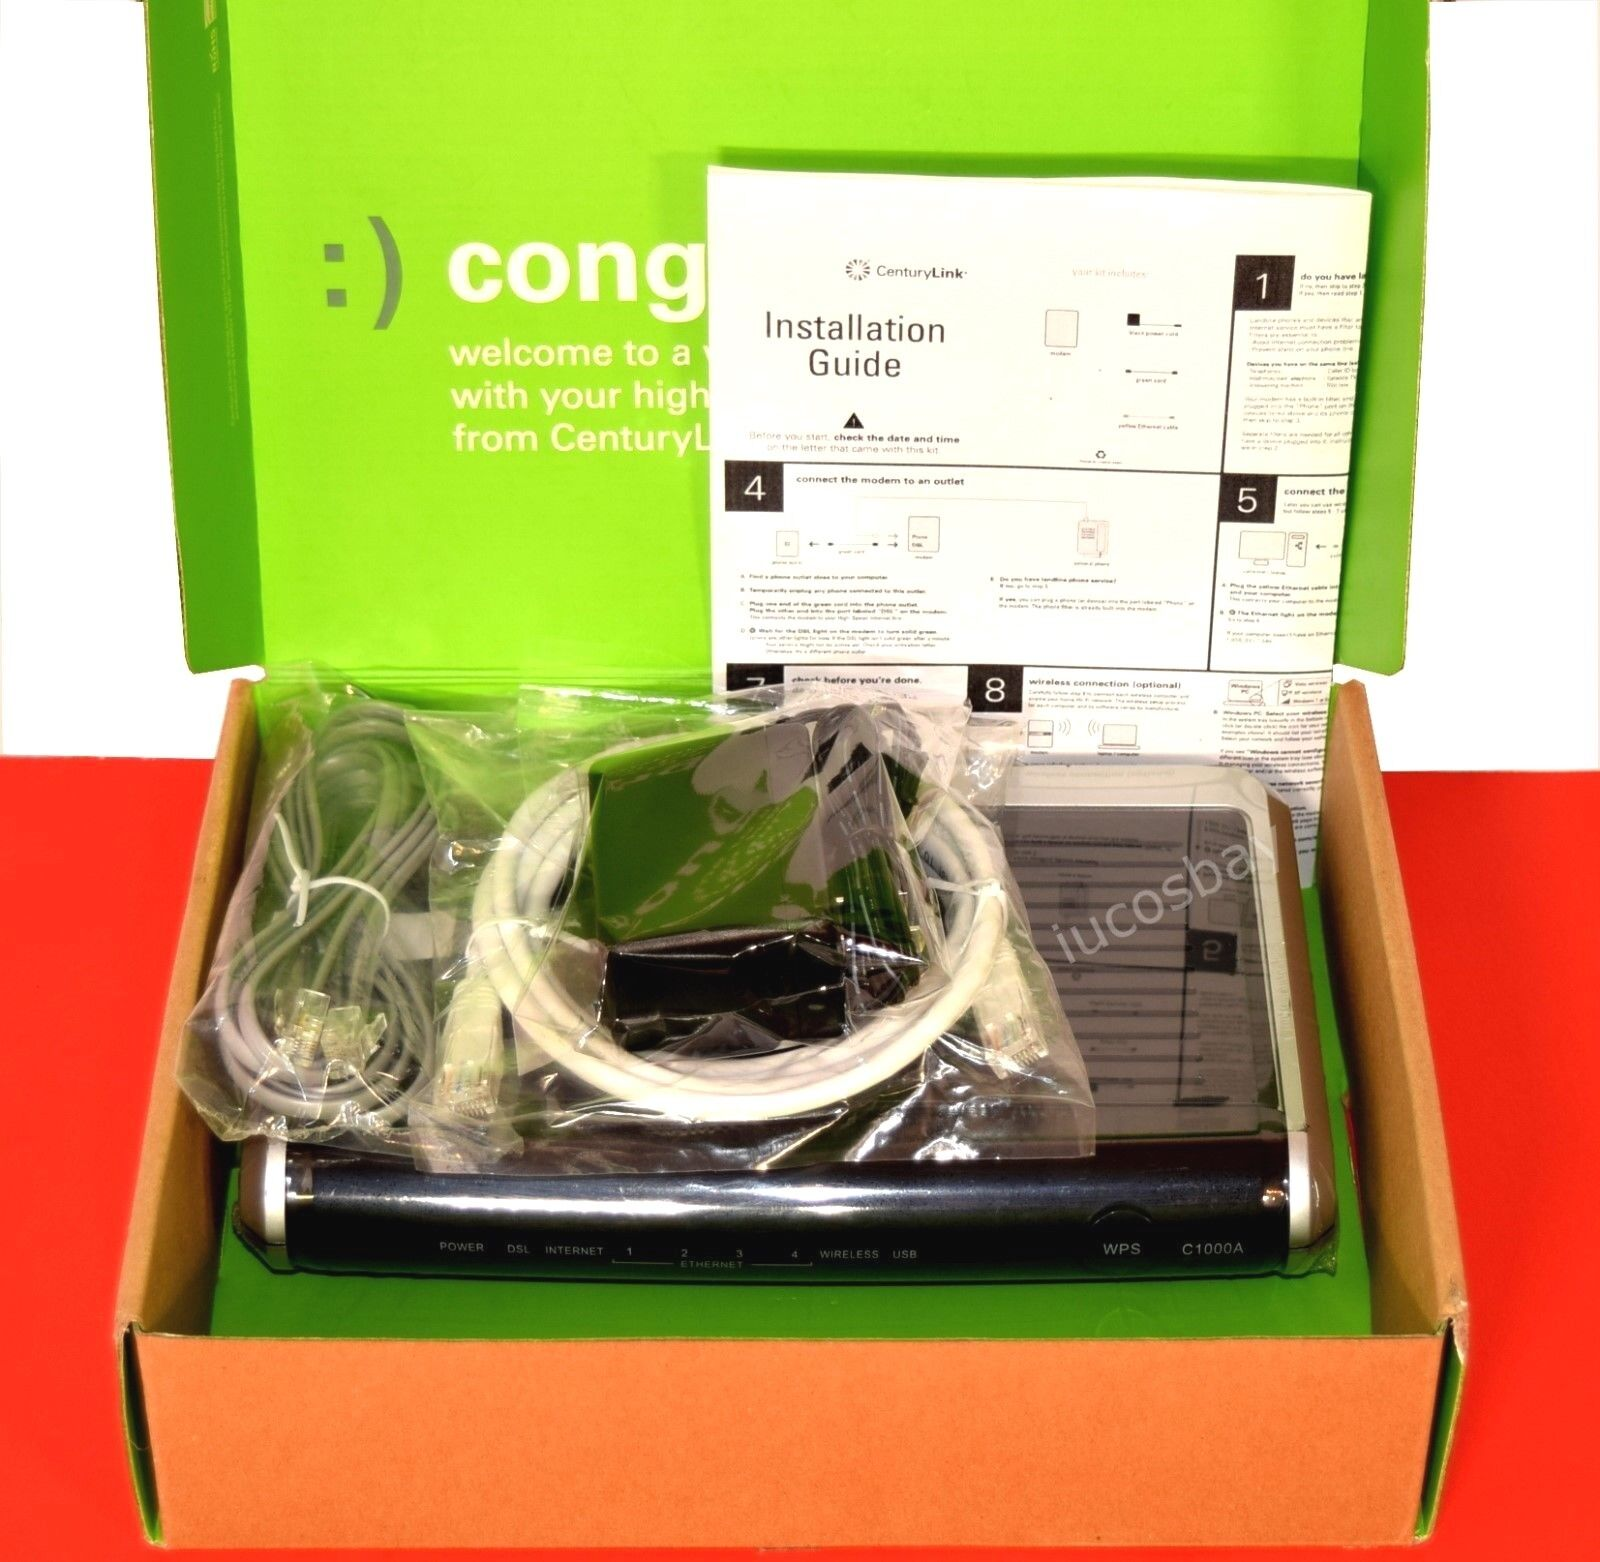 Actiontec CenturyLink C1000A 802 11N Wireless N Router Gigabit Modem Sealed